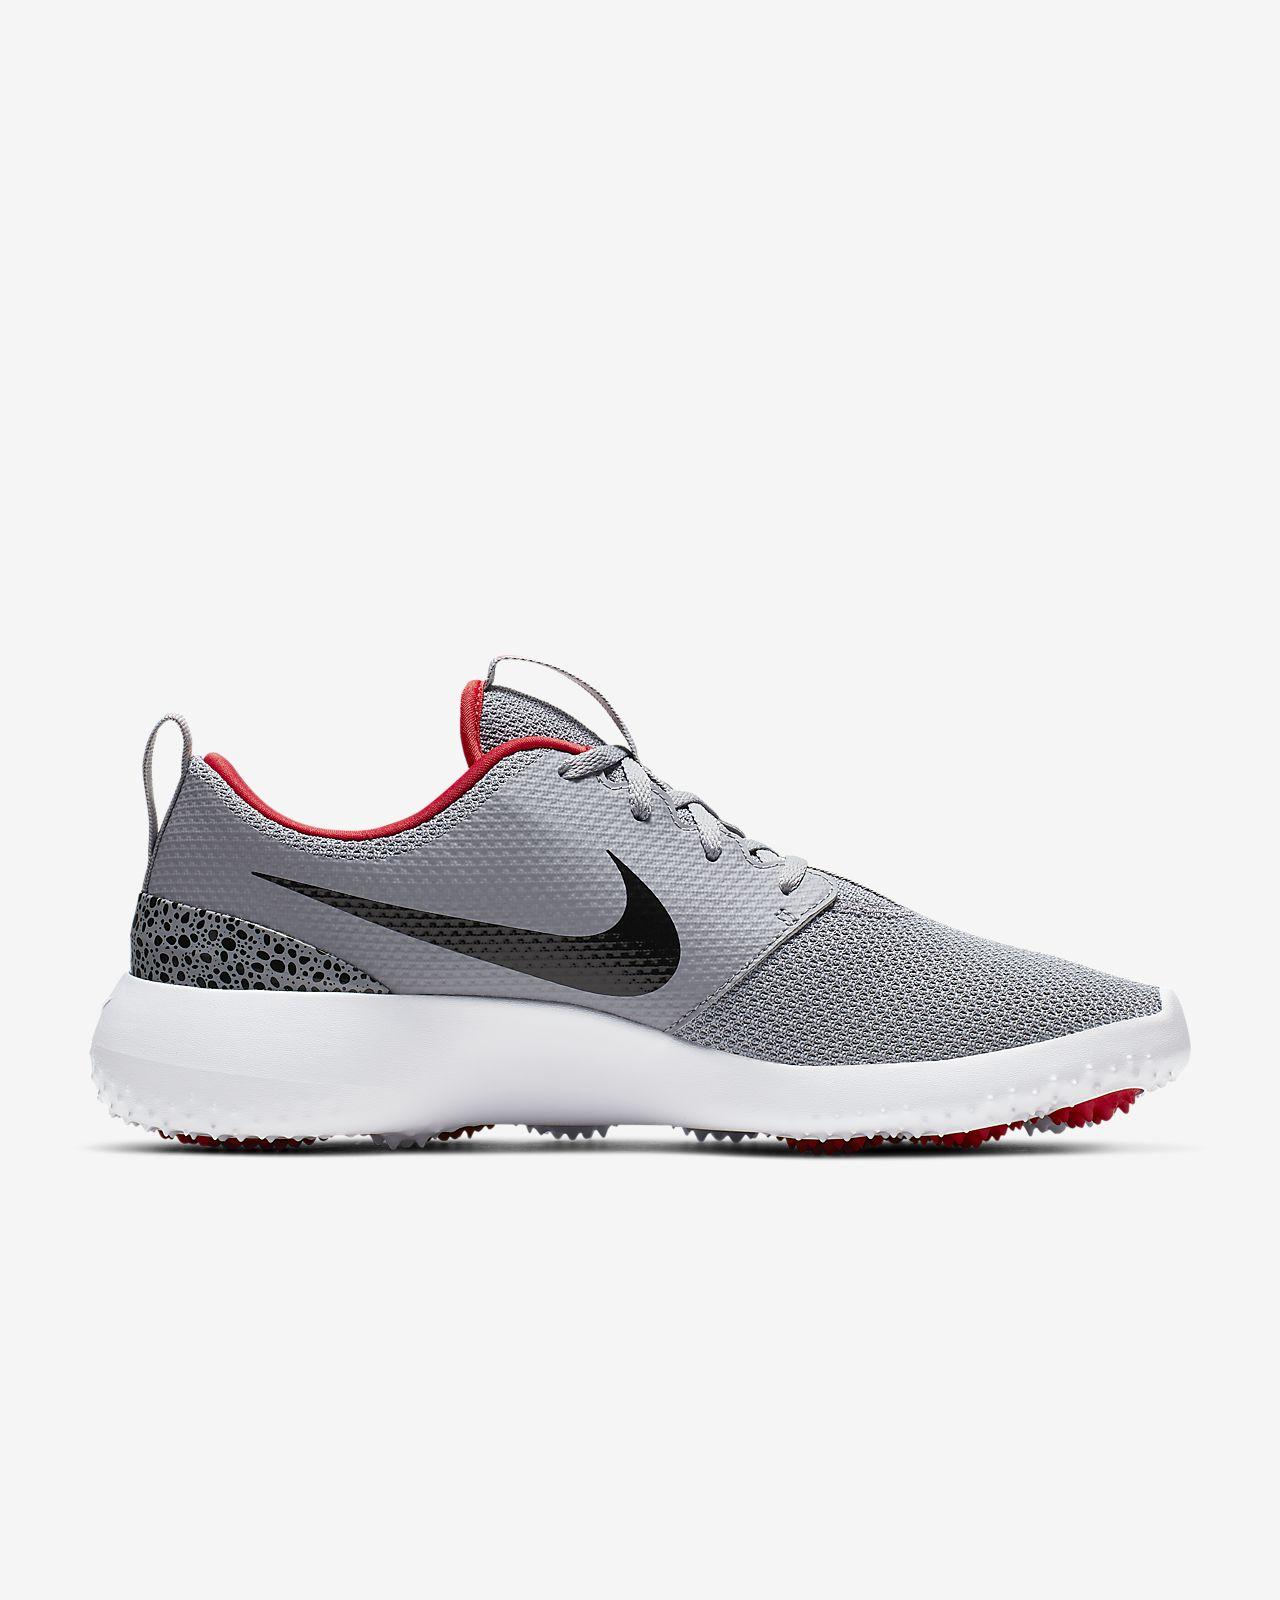 best website 3524c 85d25 ... Chaussure de golf Nike Roshe G pour Homme